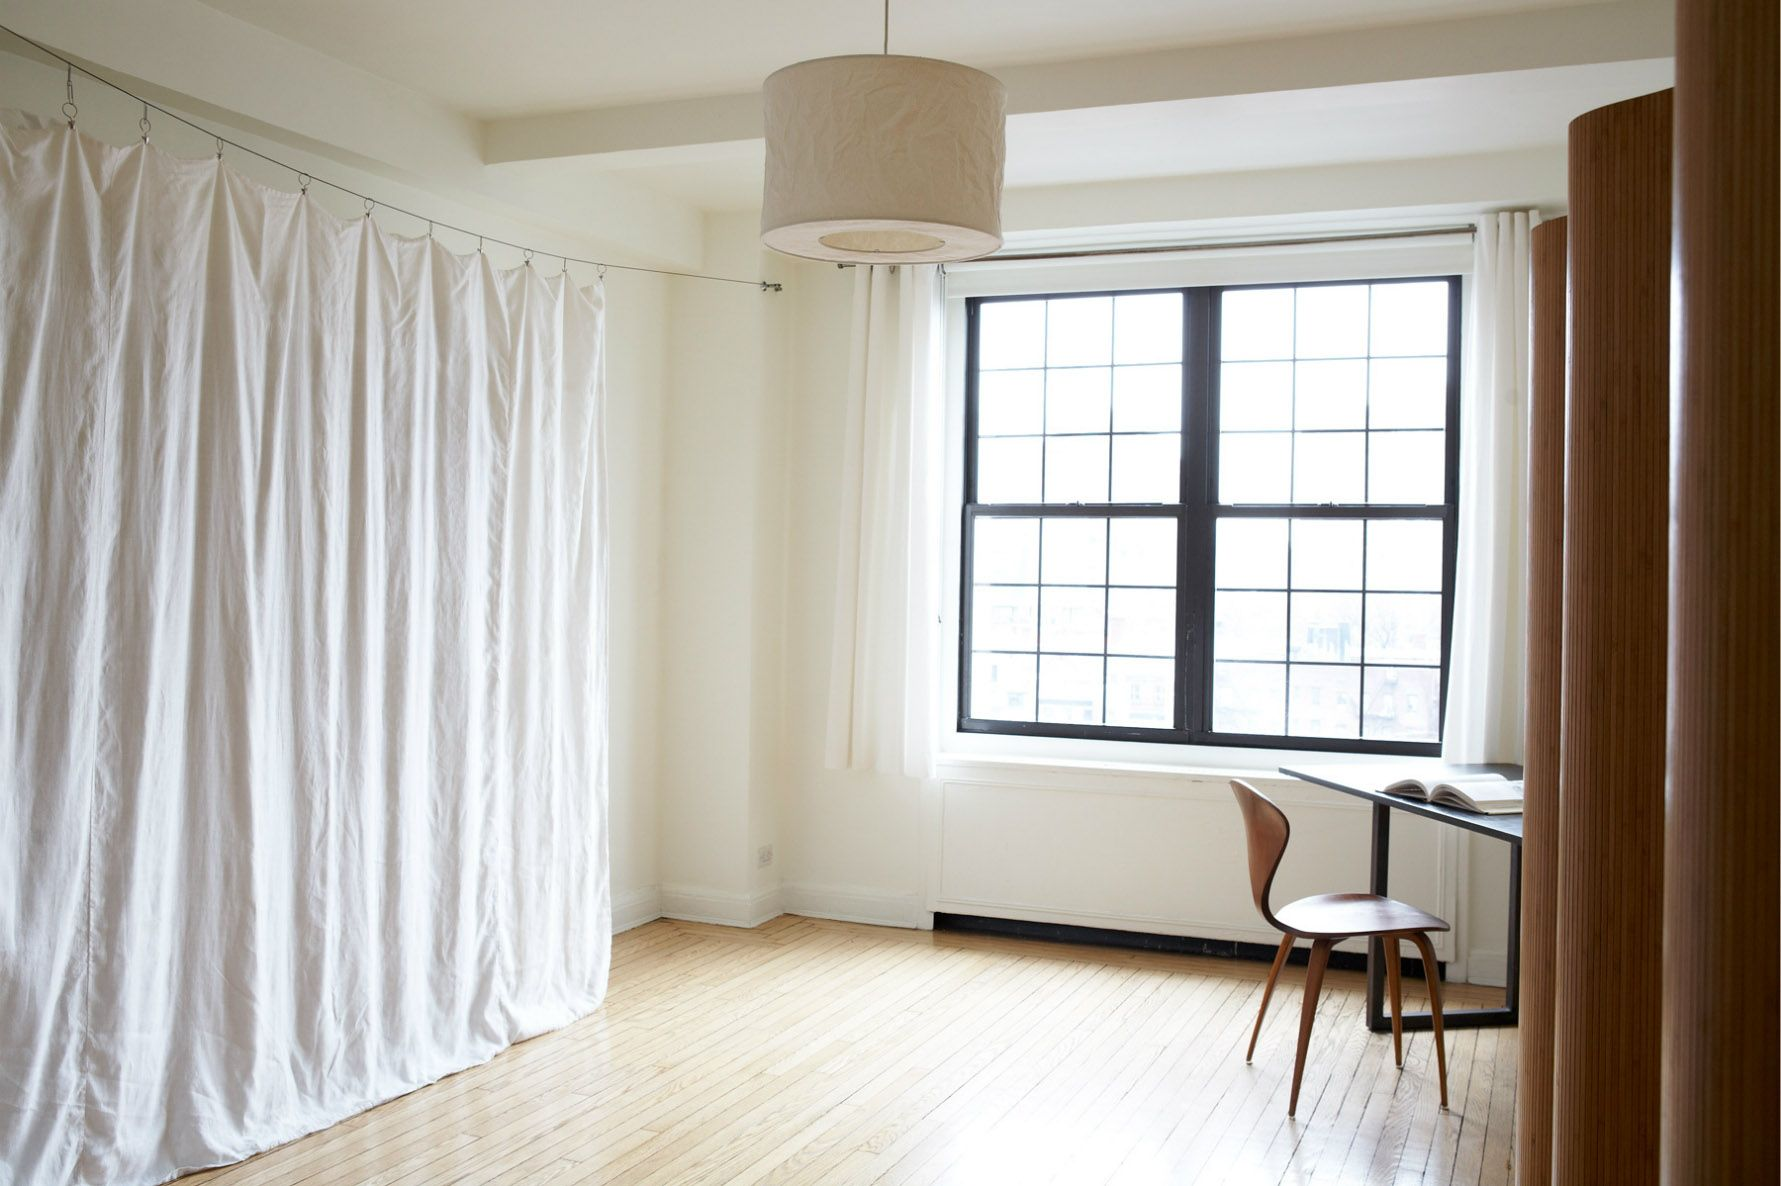 Ellen silverman my abode pinterest murphy bed divider and room